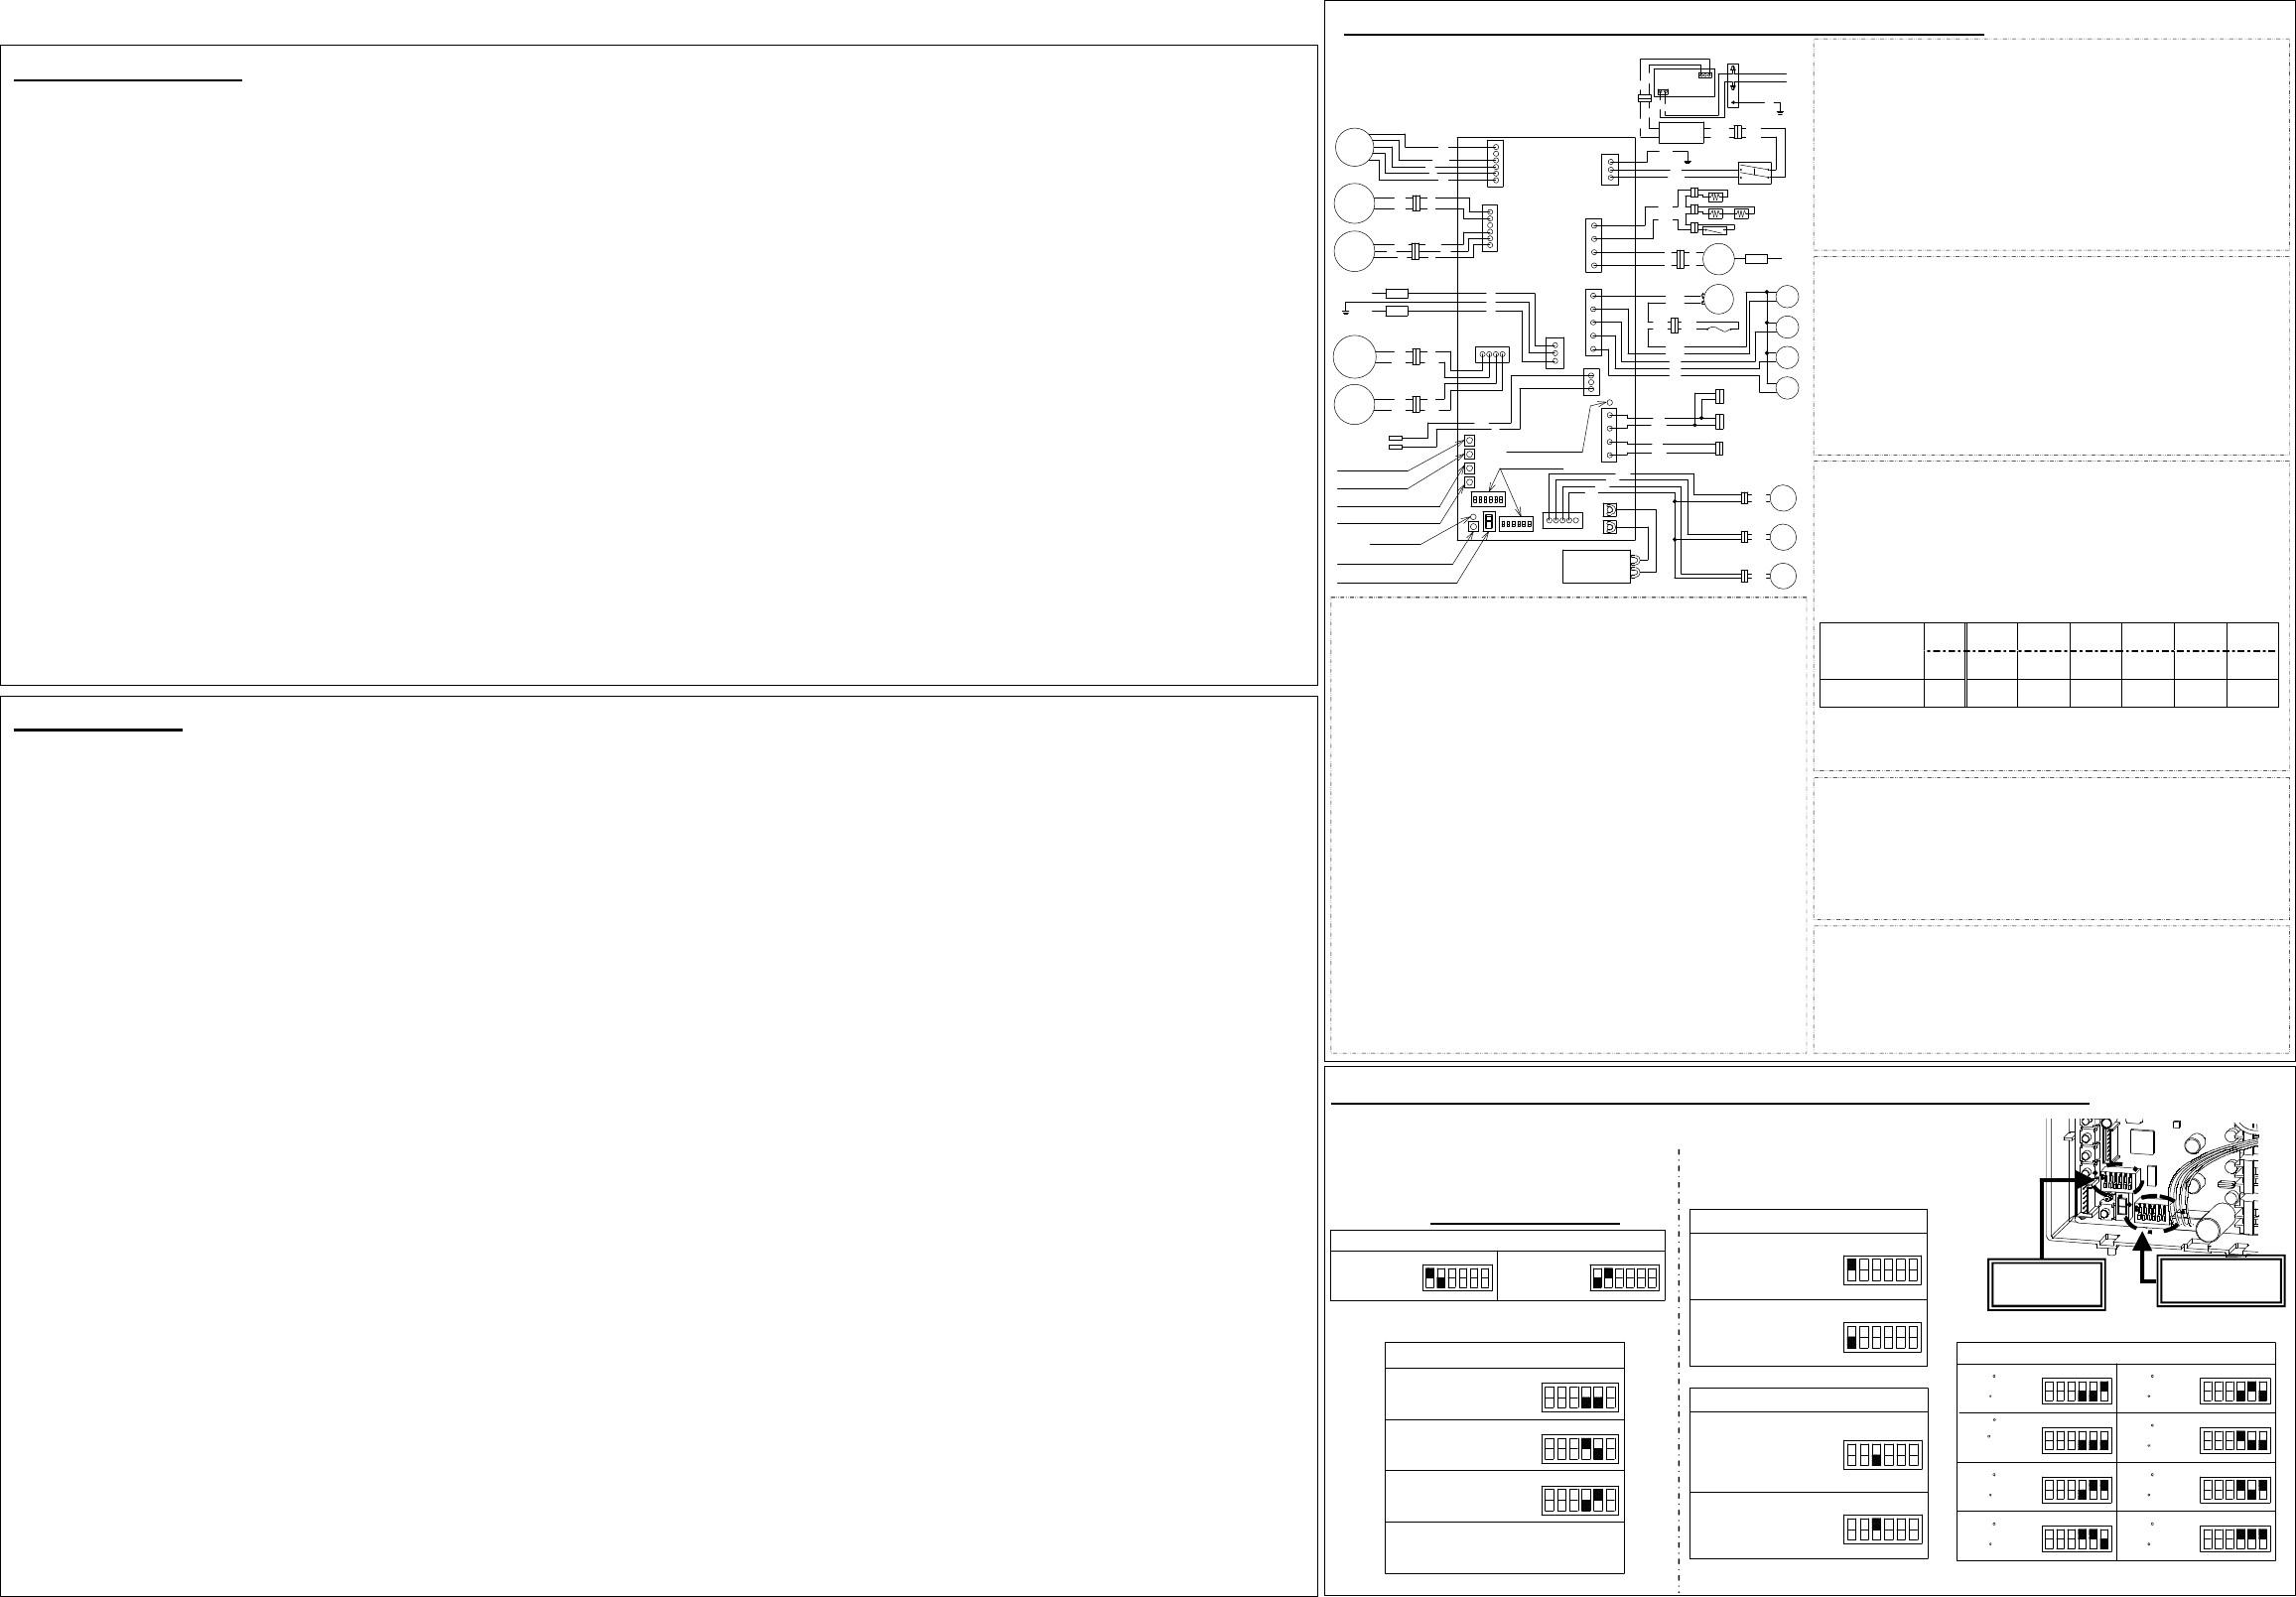 Mack Mp7 Engine Wiring Diagram | Wiring Library